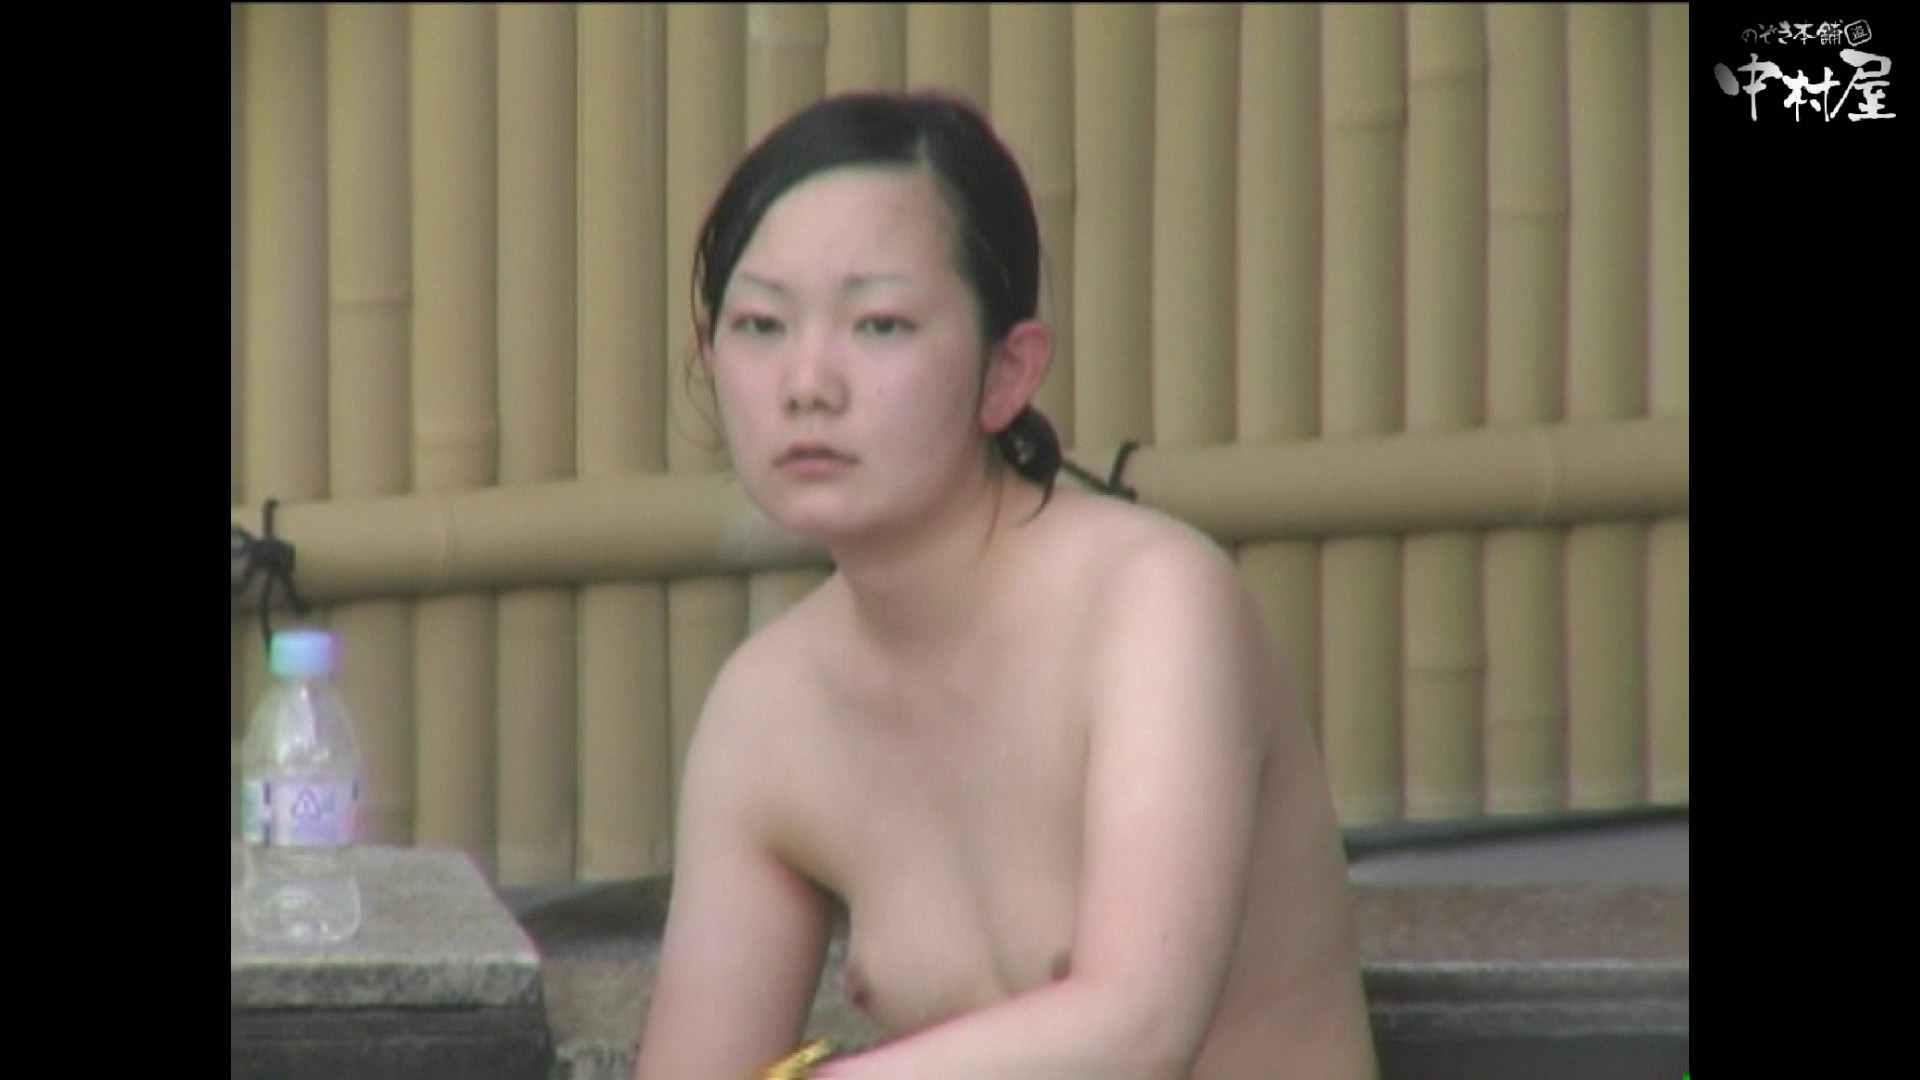 Aquaな露天風呂Vol.892 露天風呂   OLのエロ生活  39連発 4